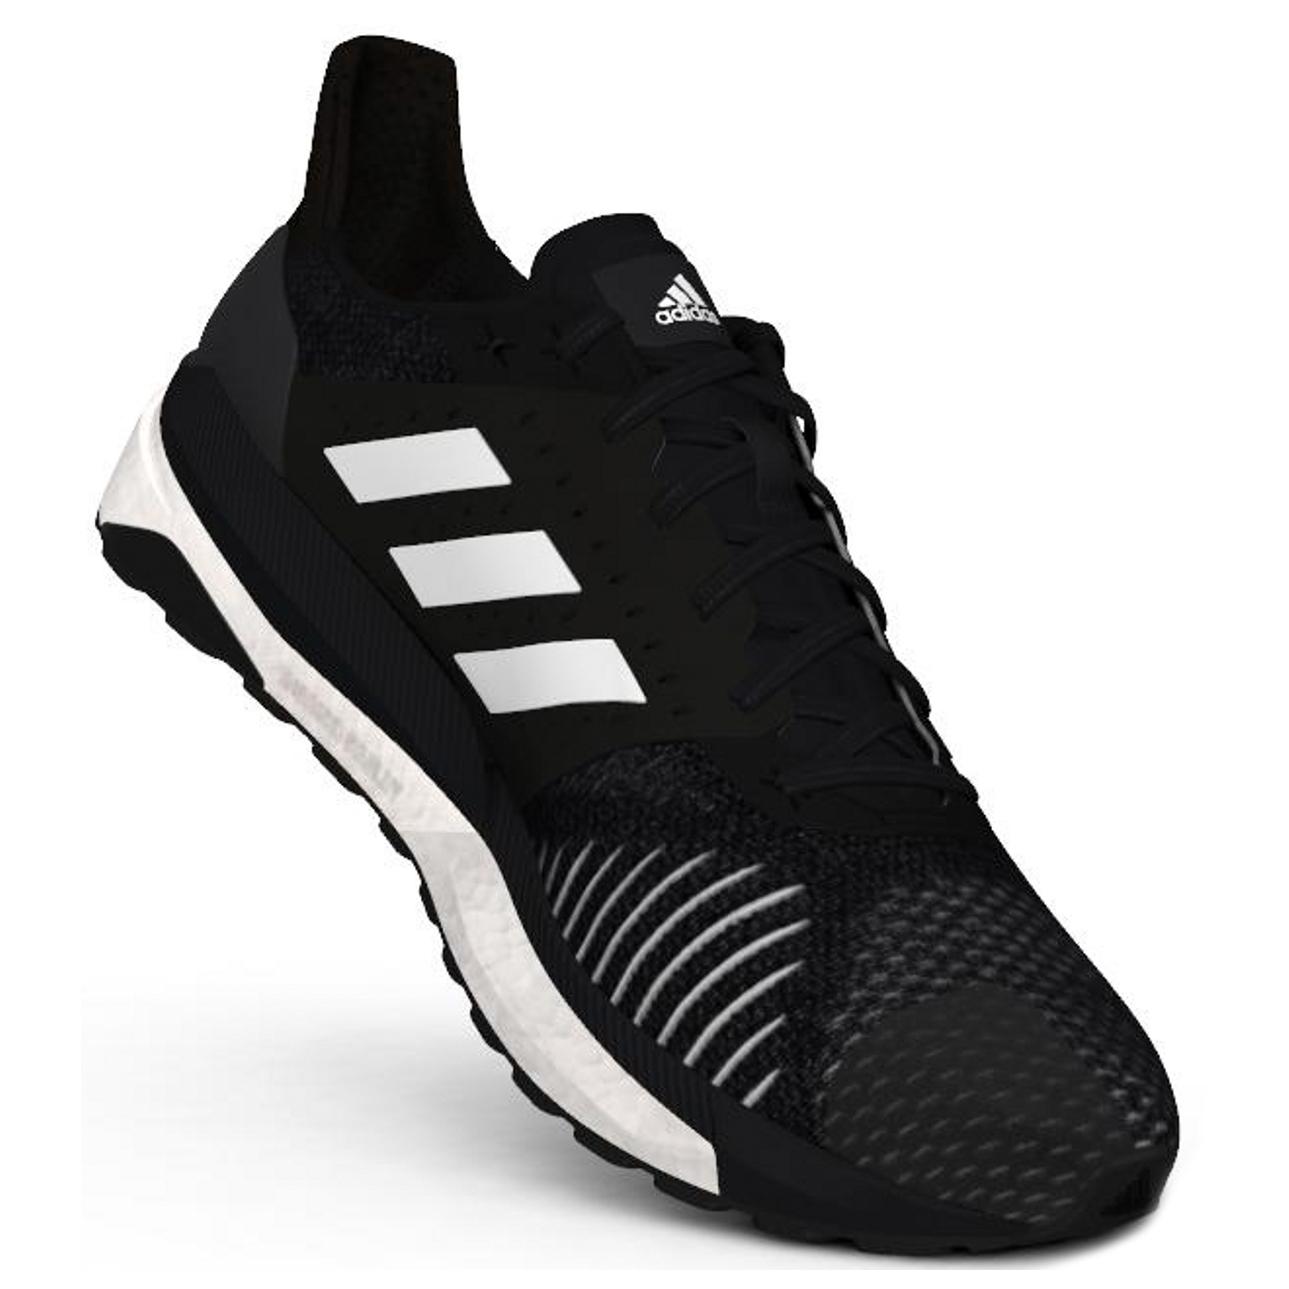 Adidas Solar Glide ST Running sko Herre Gratis Gratis